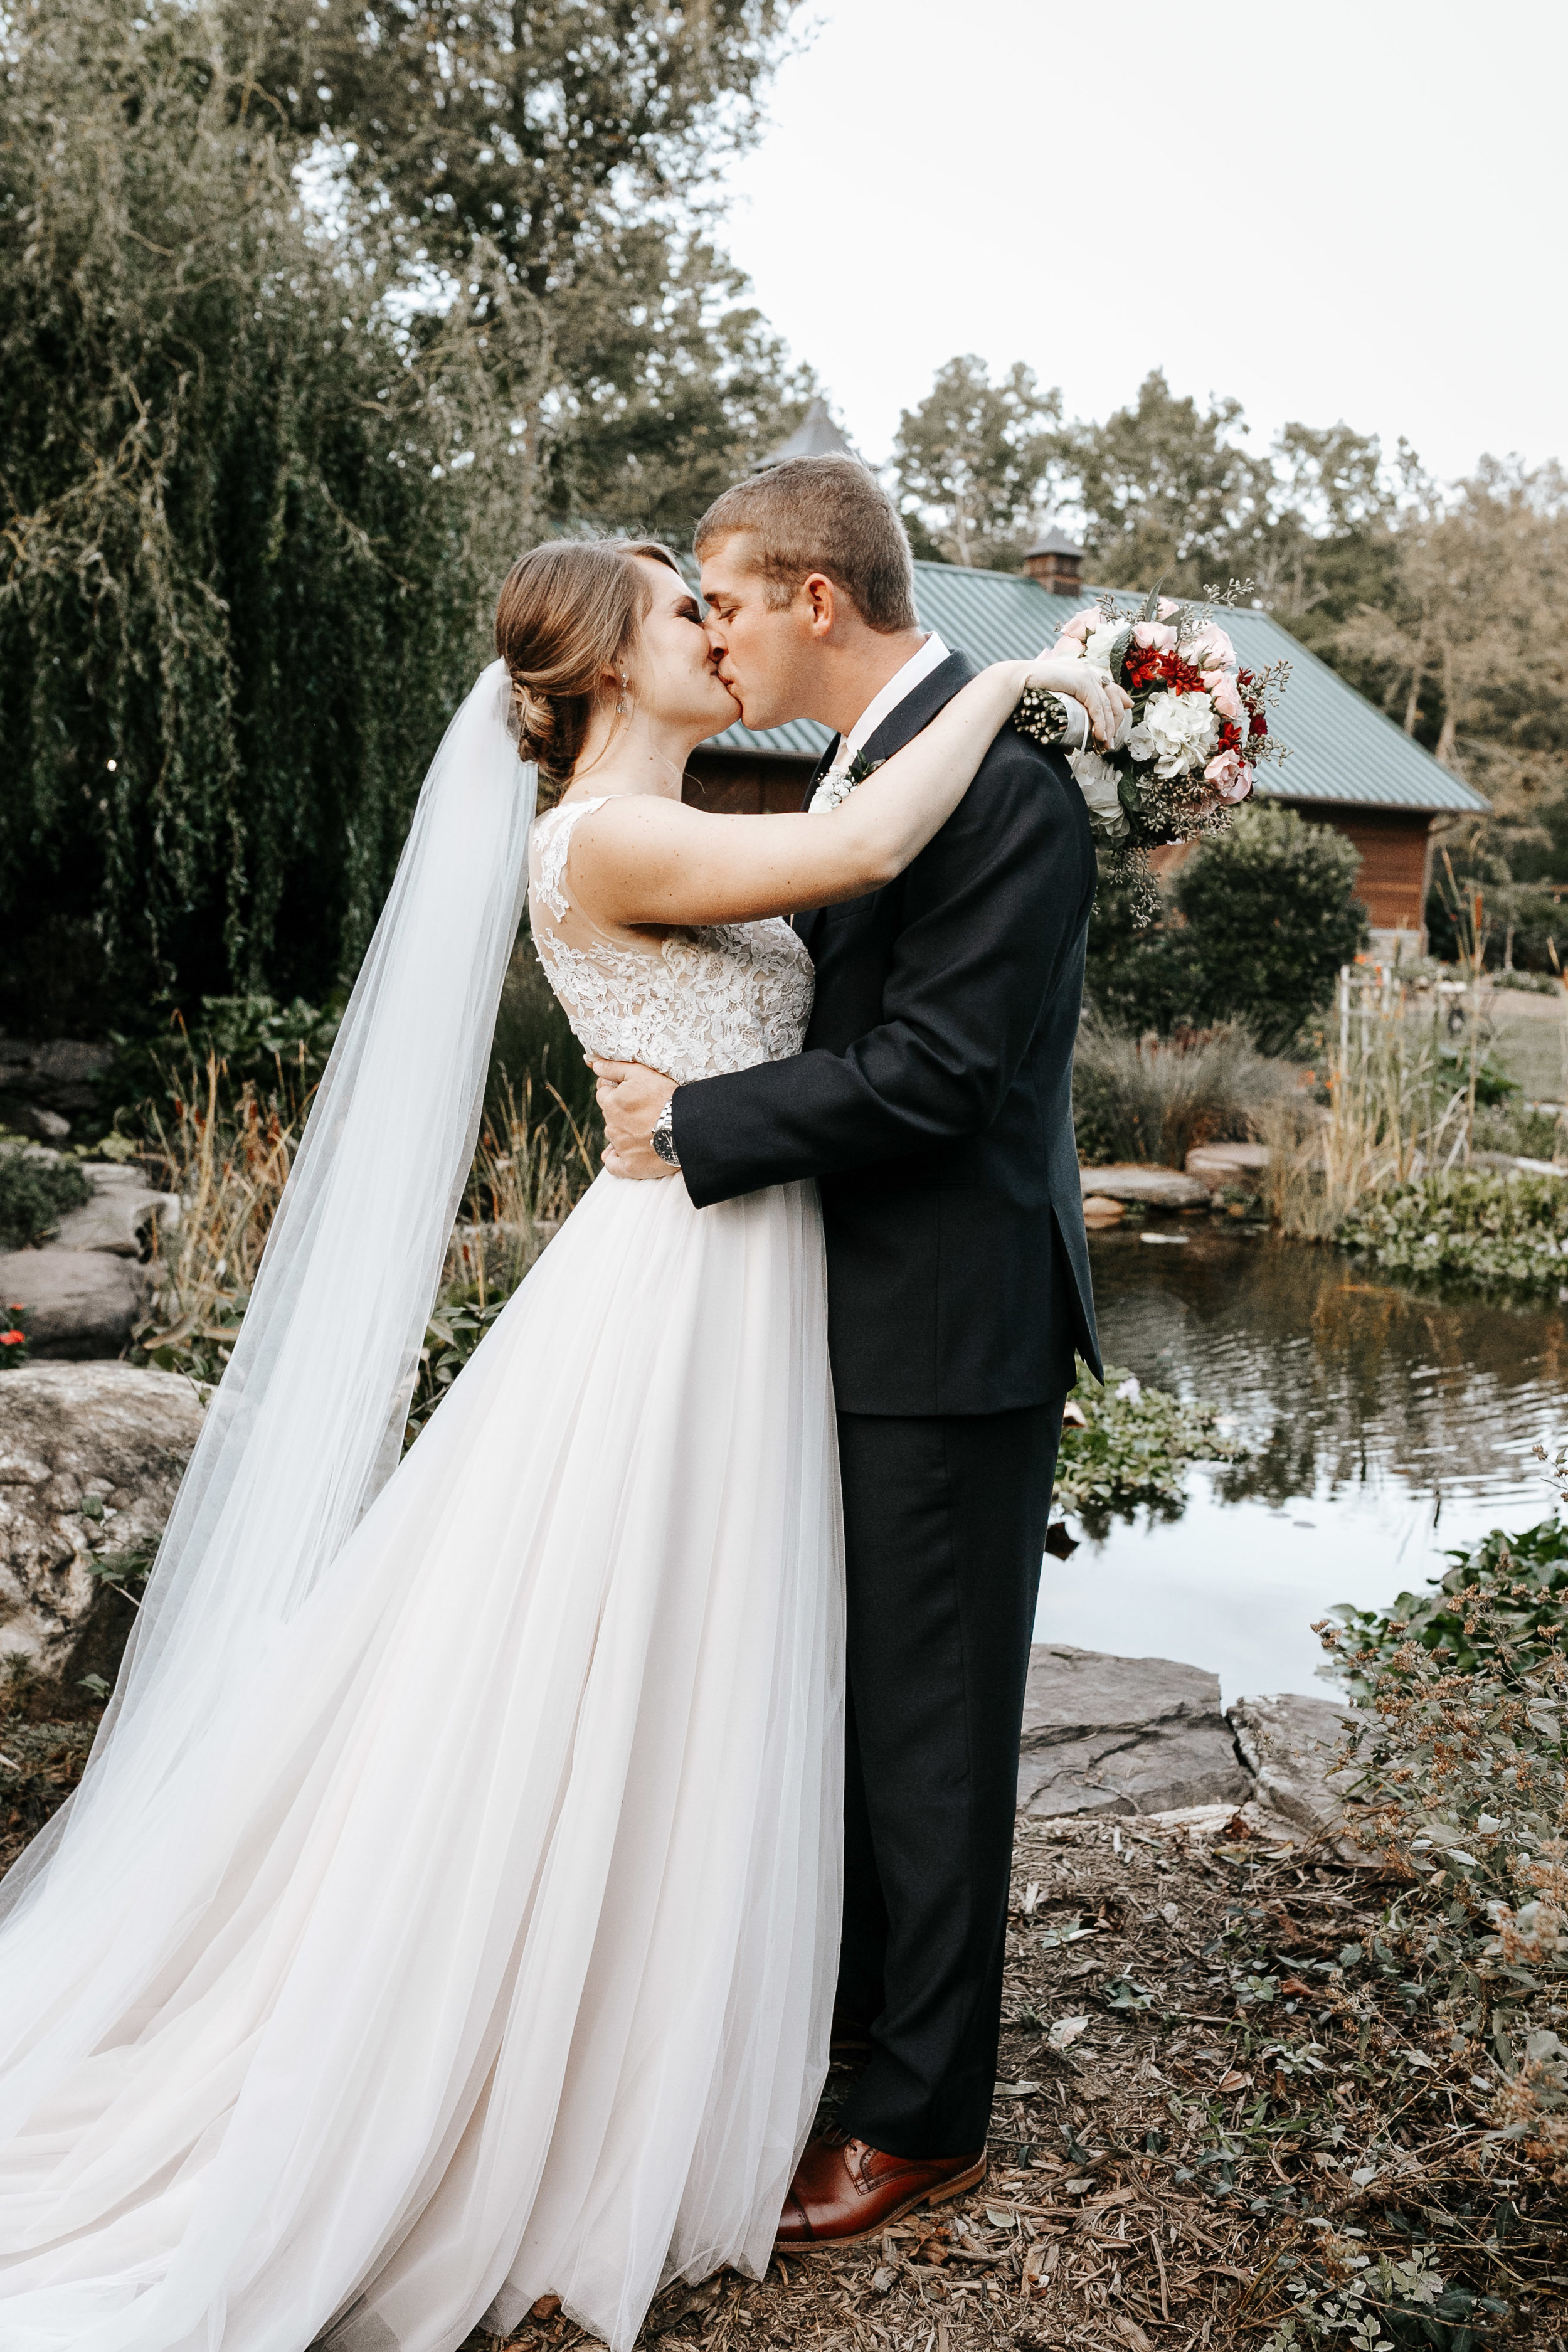 jessicabrandonwedding-46.jpg